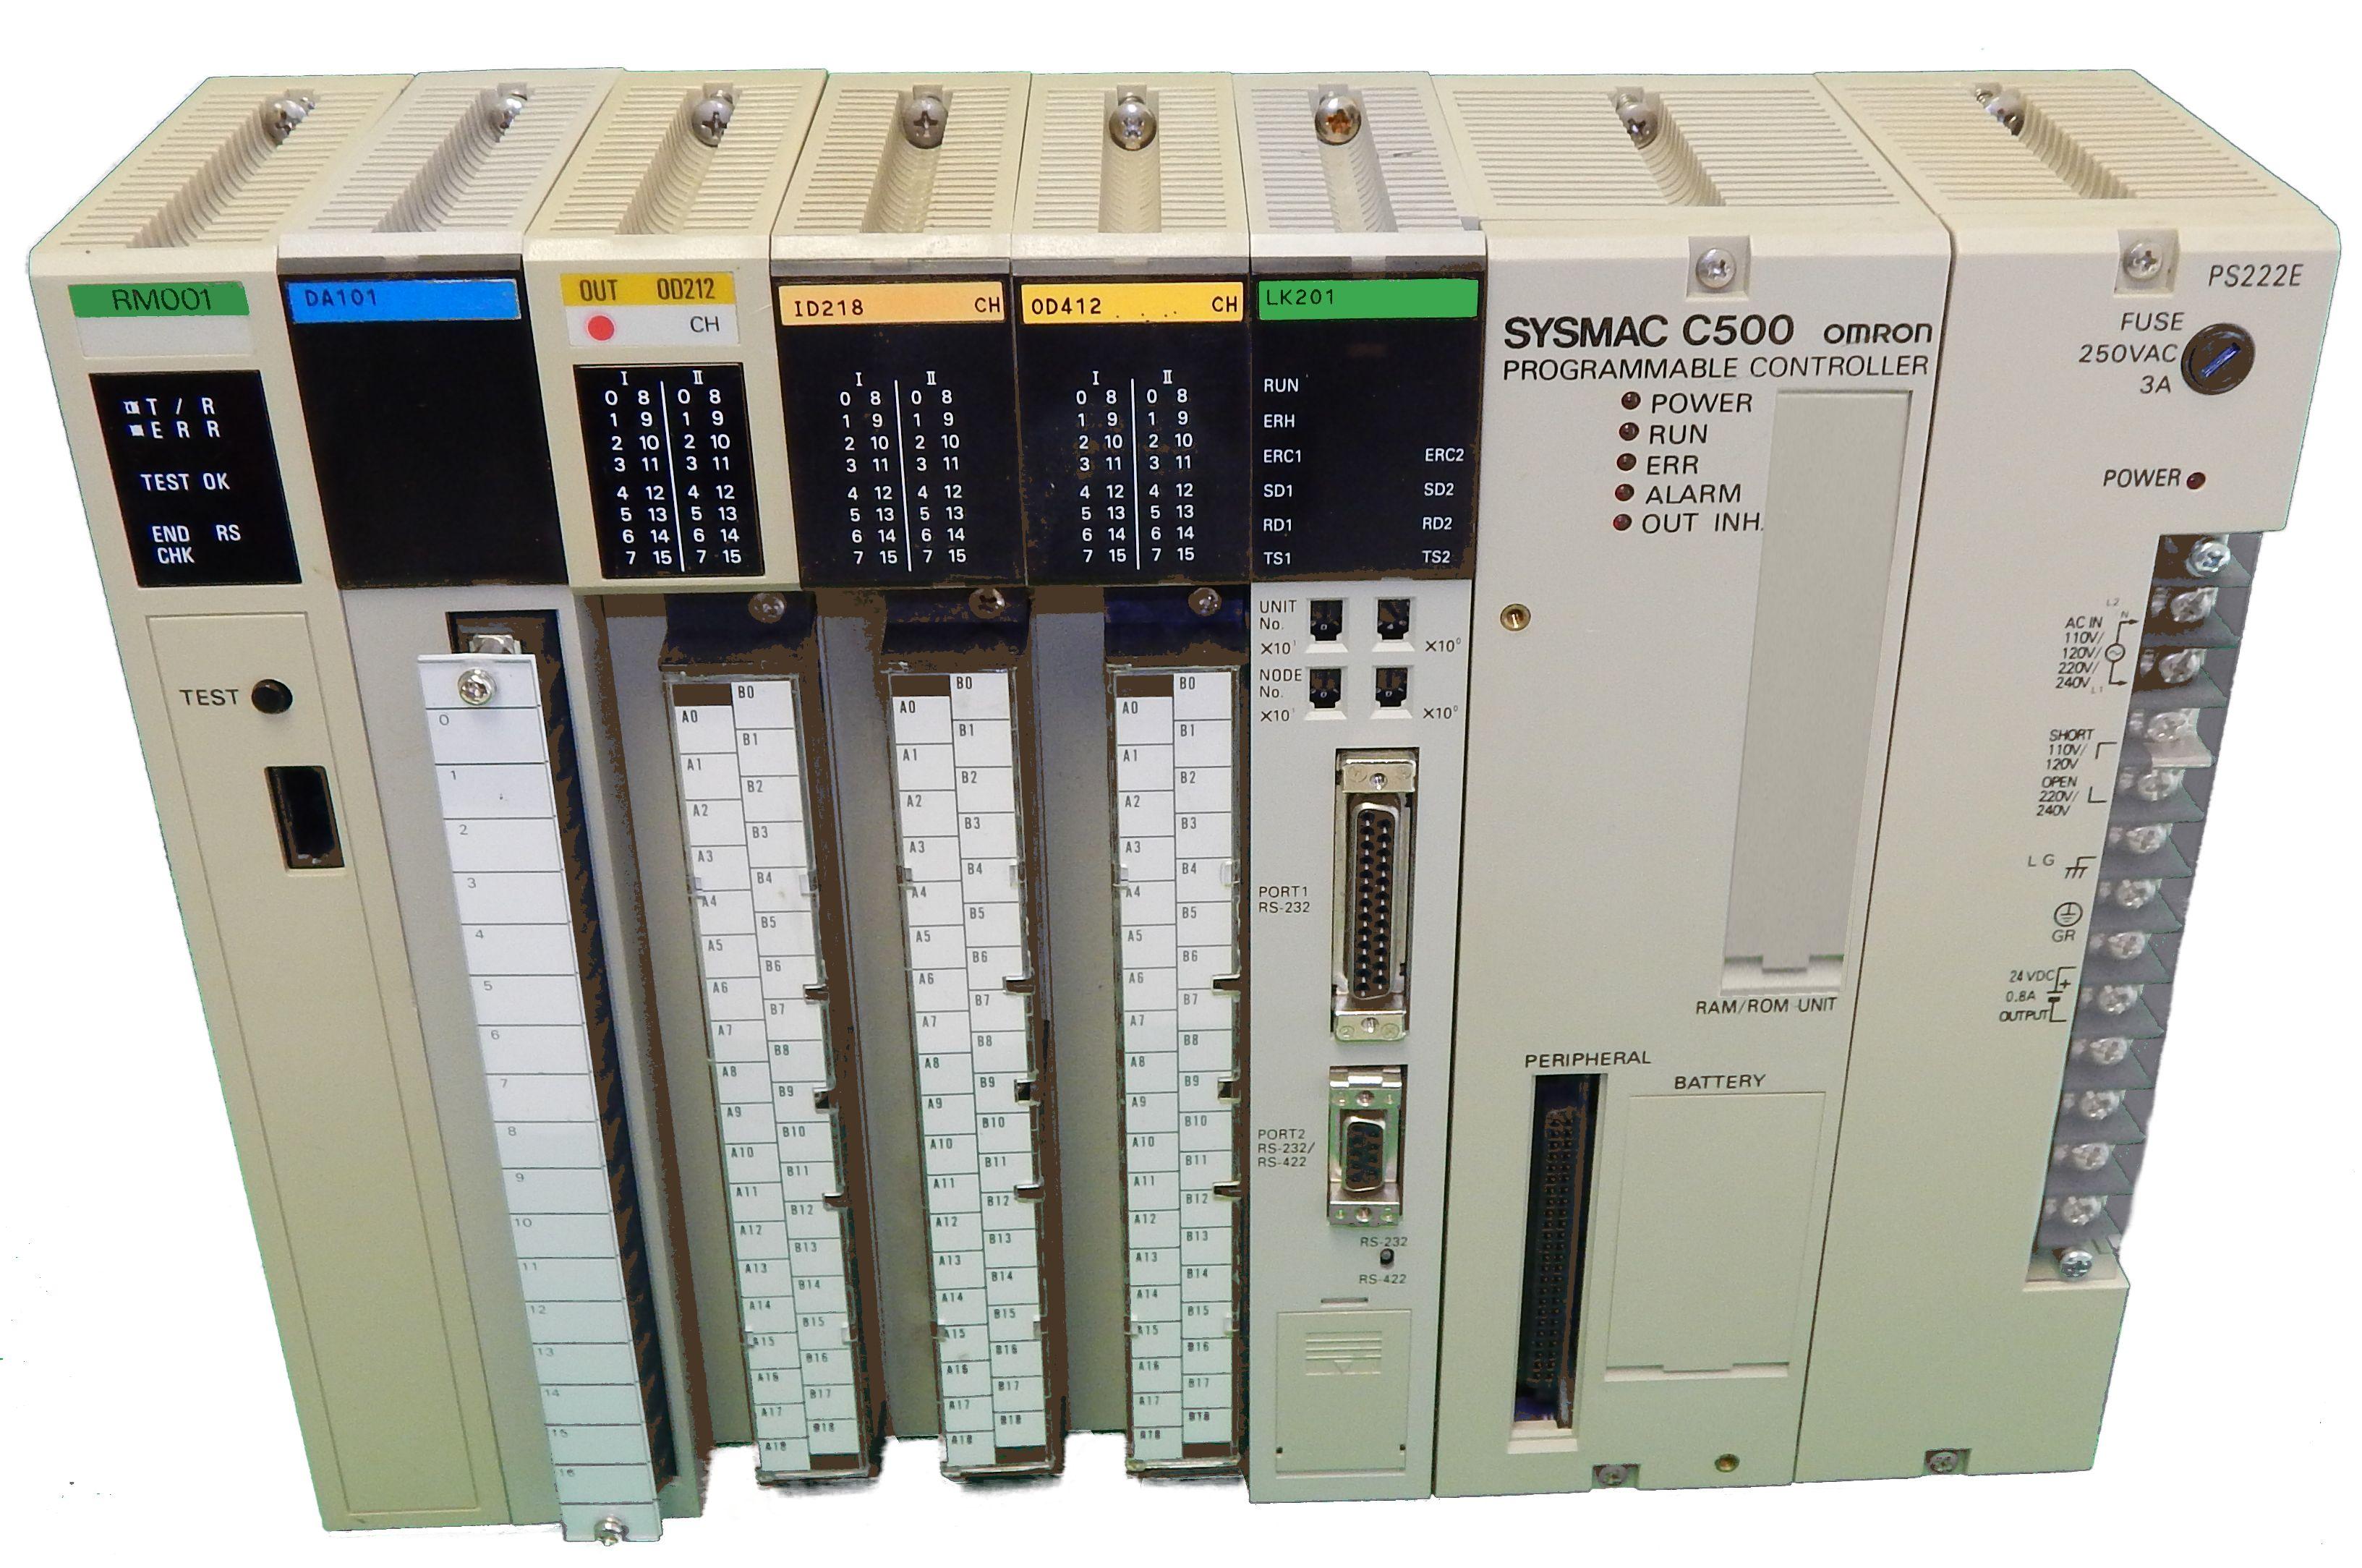 3G2C7-LK201-EV1